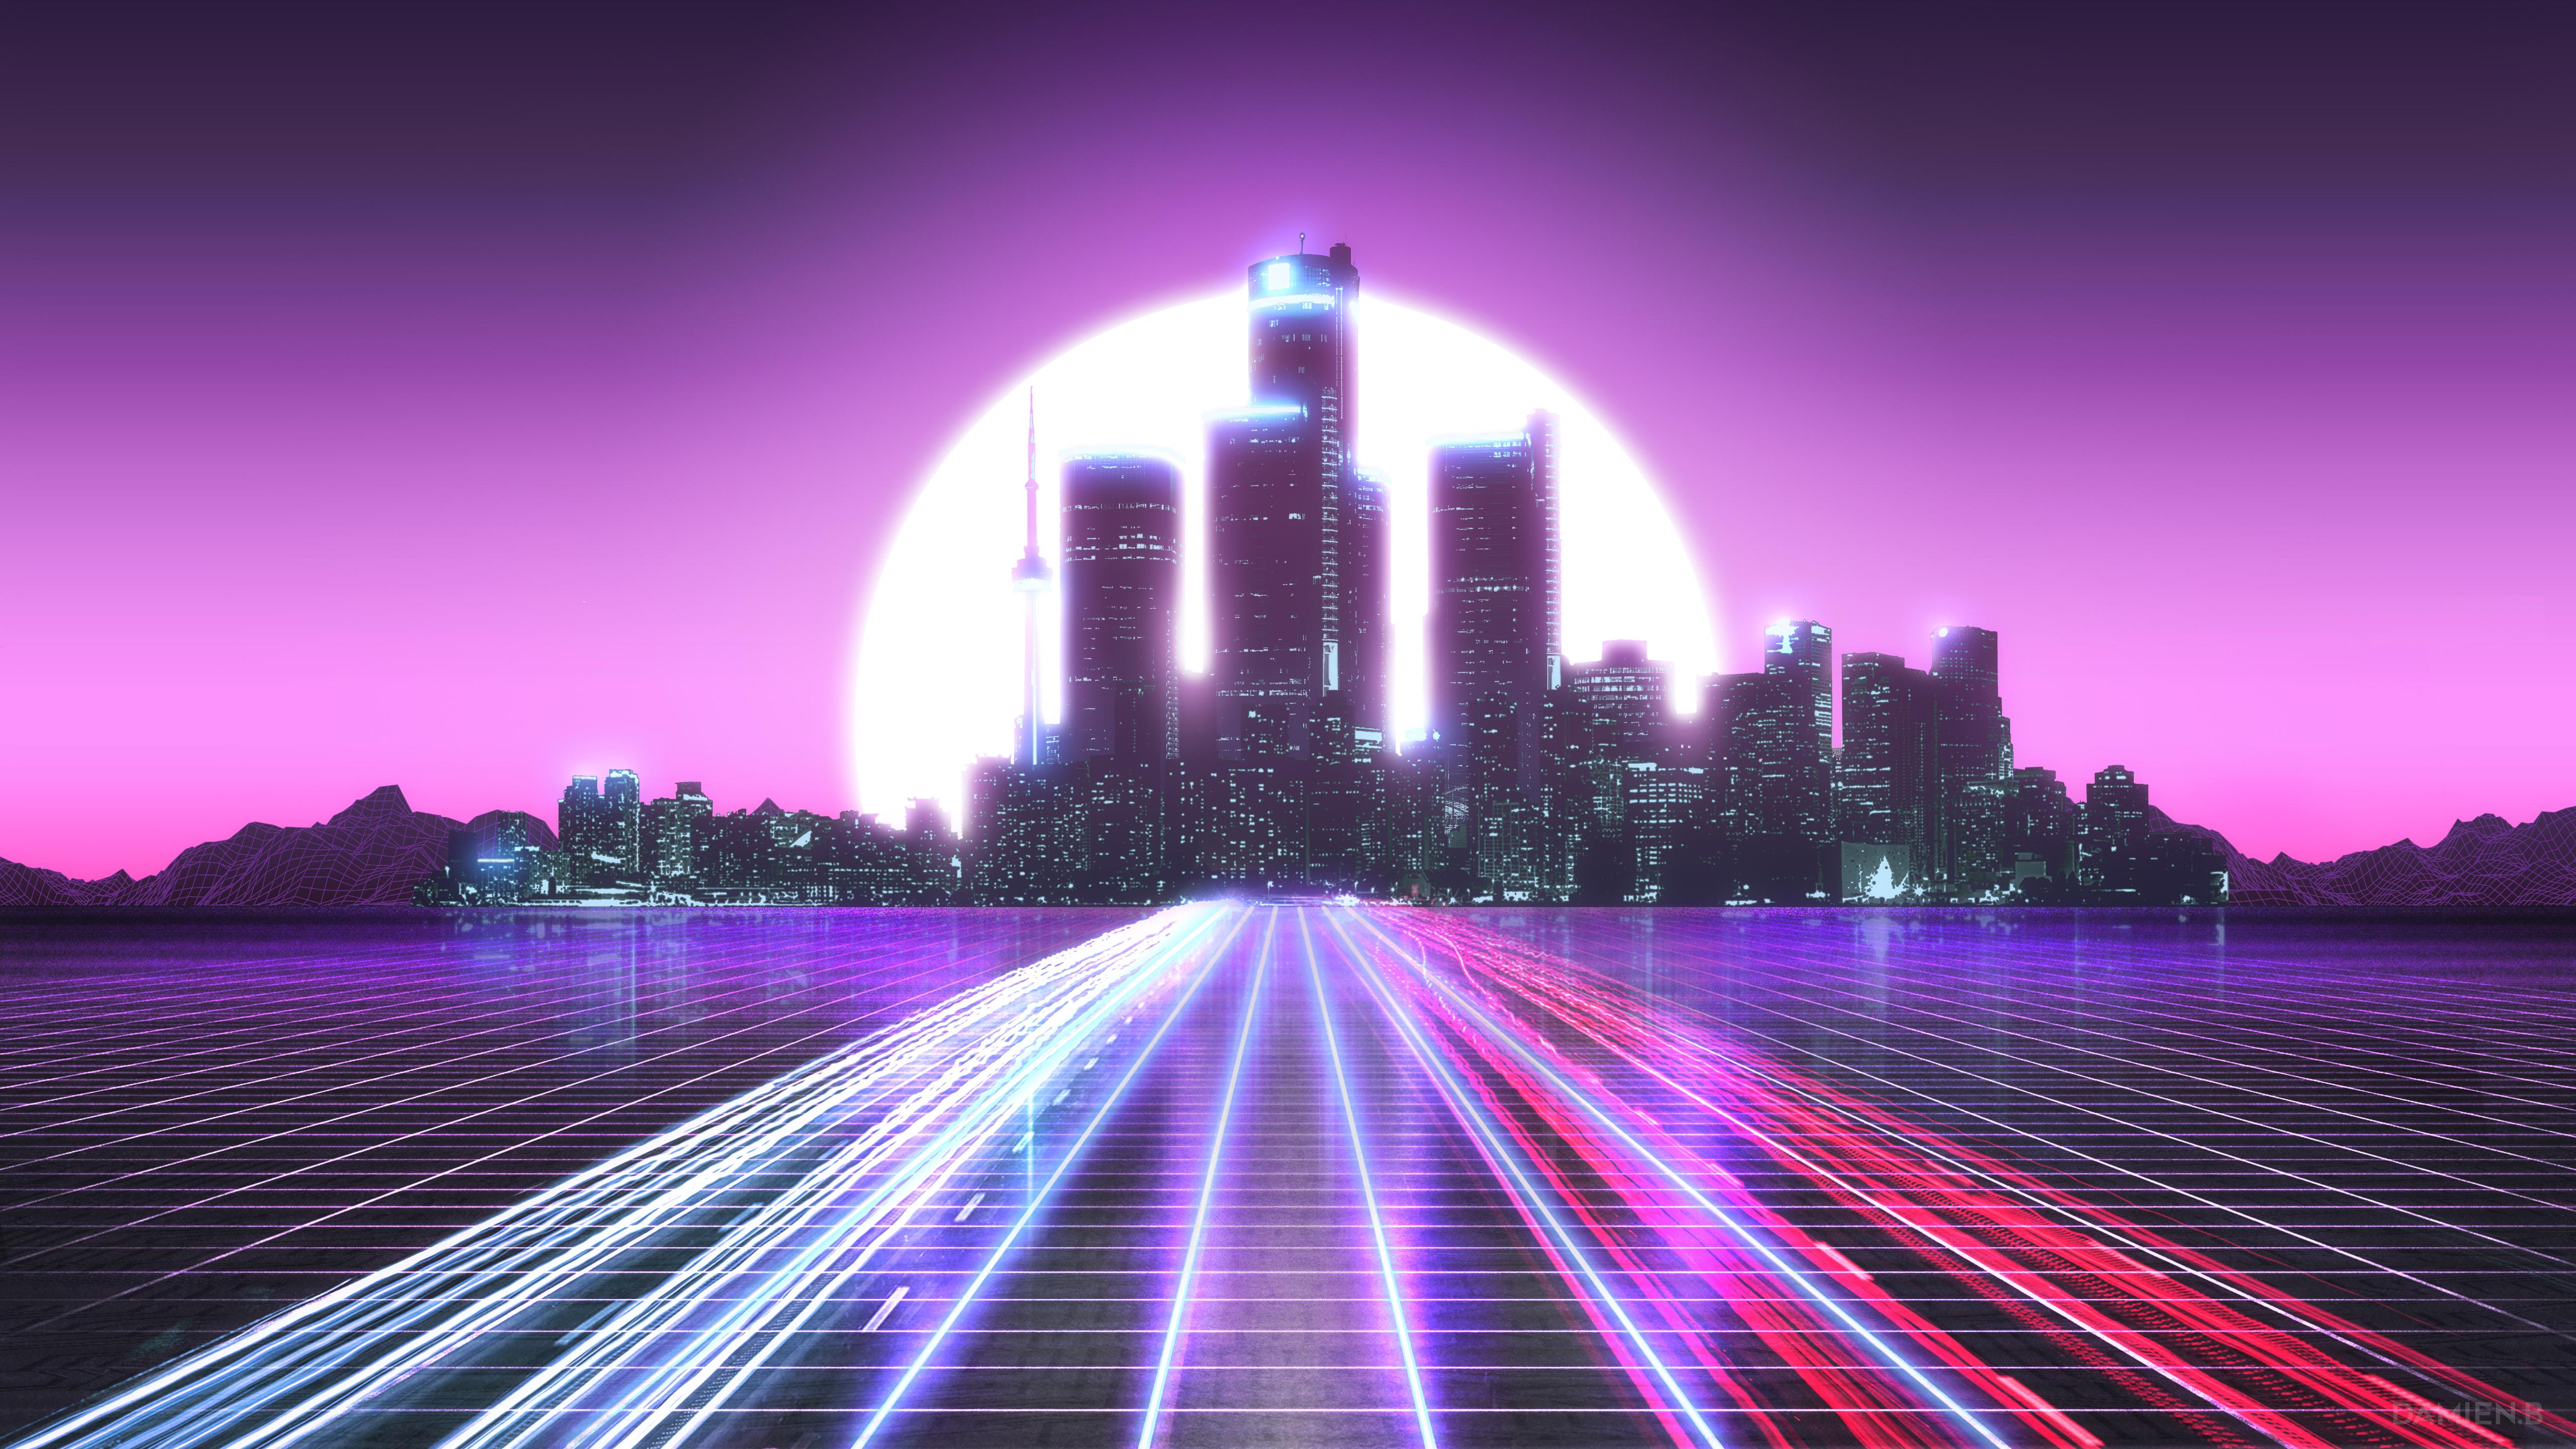 Wallpaper Digital Art Artwork Illustration Vaporwave Retrowave Synthwave Lines Neon Lights City Lights Landscape Sunlight Sun Cityscape Skyscraper Tower Architecture Building Urban Purple Red Blue Skyline Cyber 5120x2880